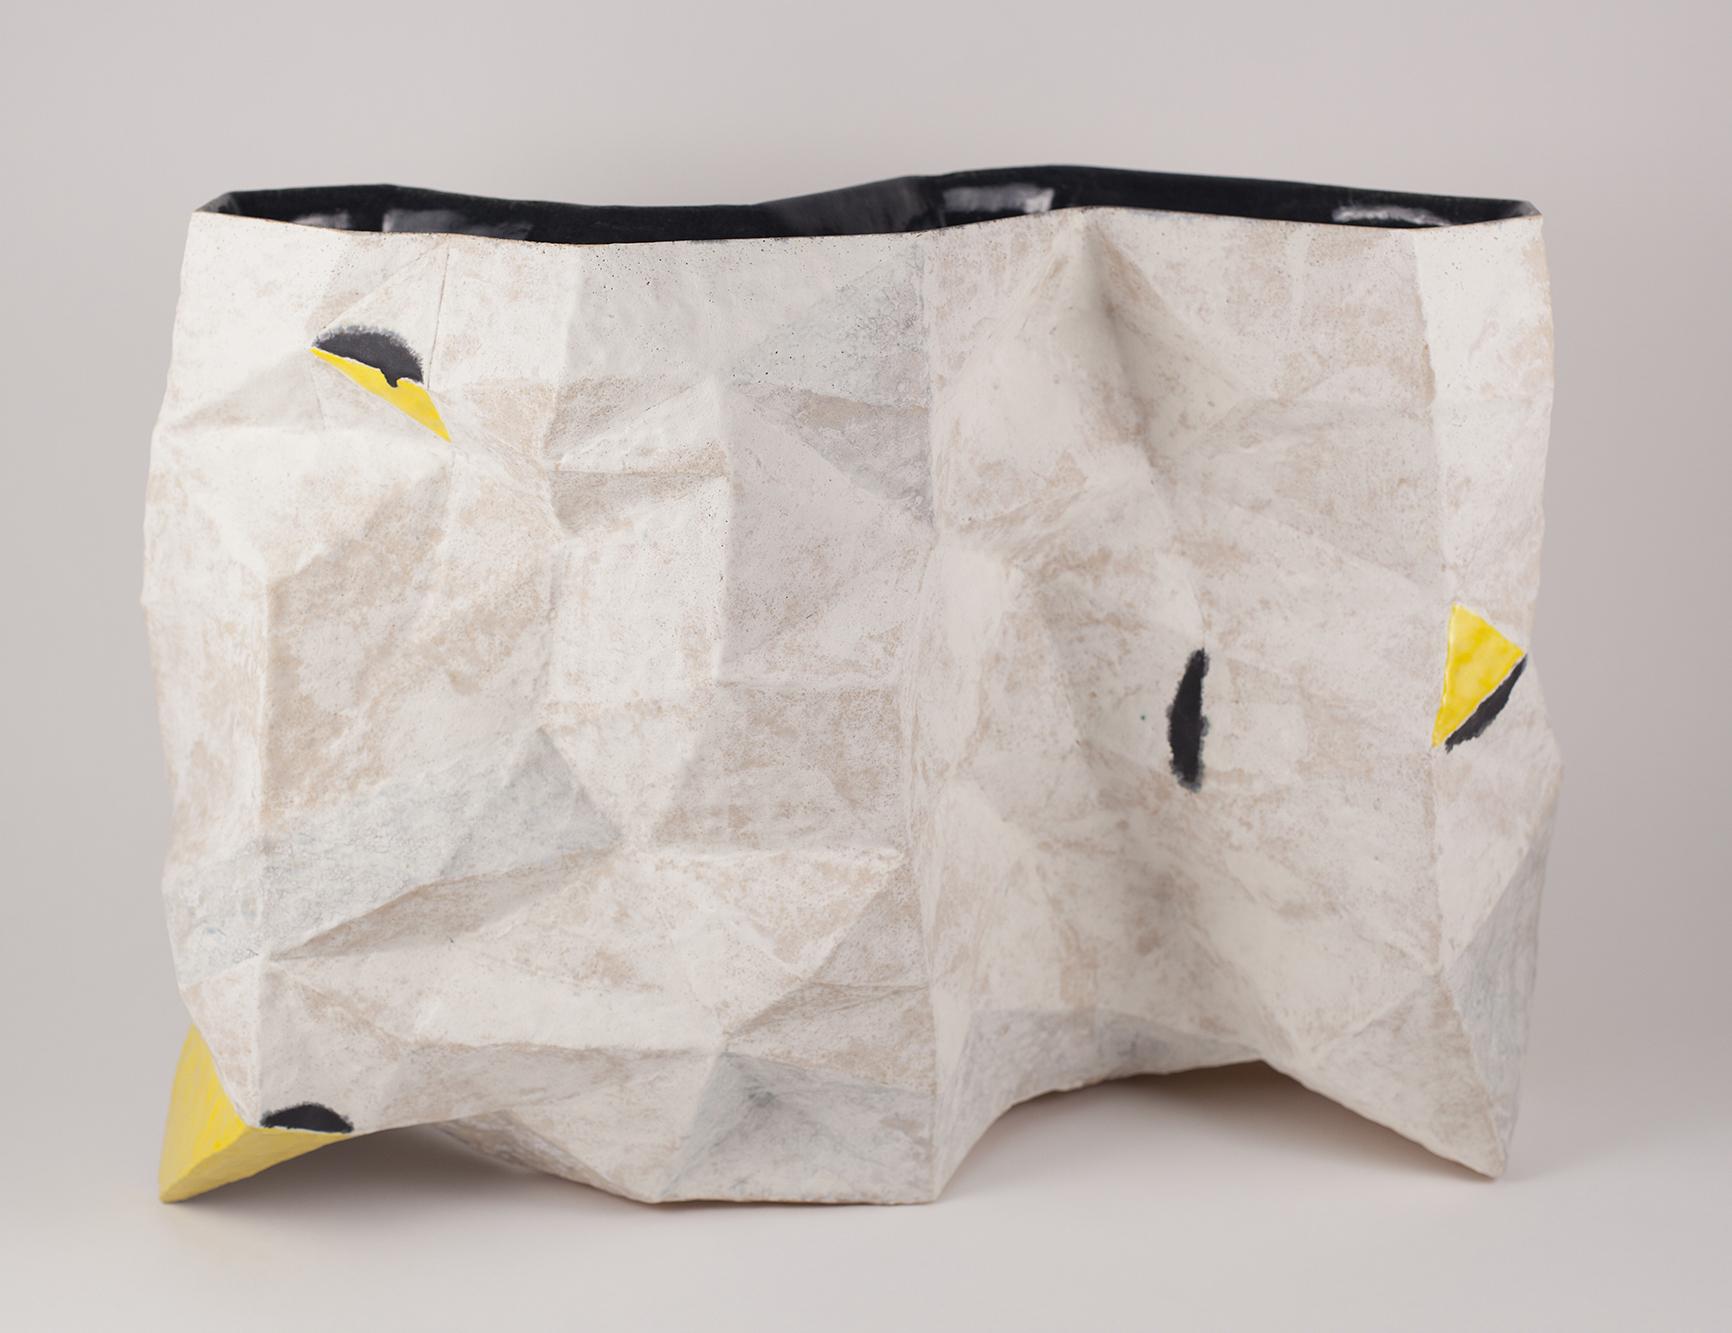 Del Harrow, Faceted Envelope (white, yellow, black, grey), 2020